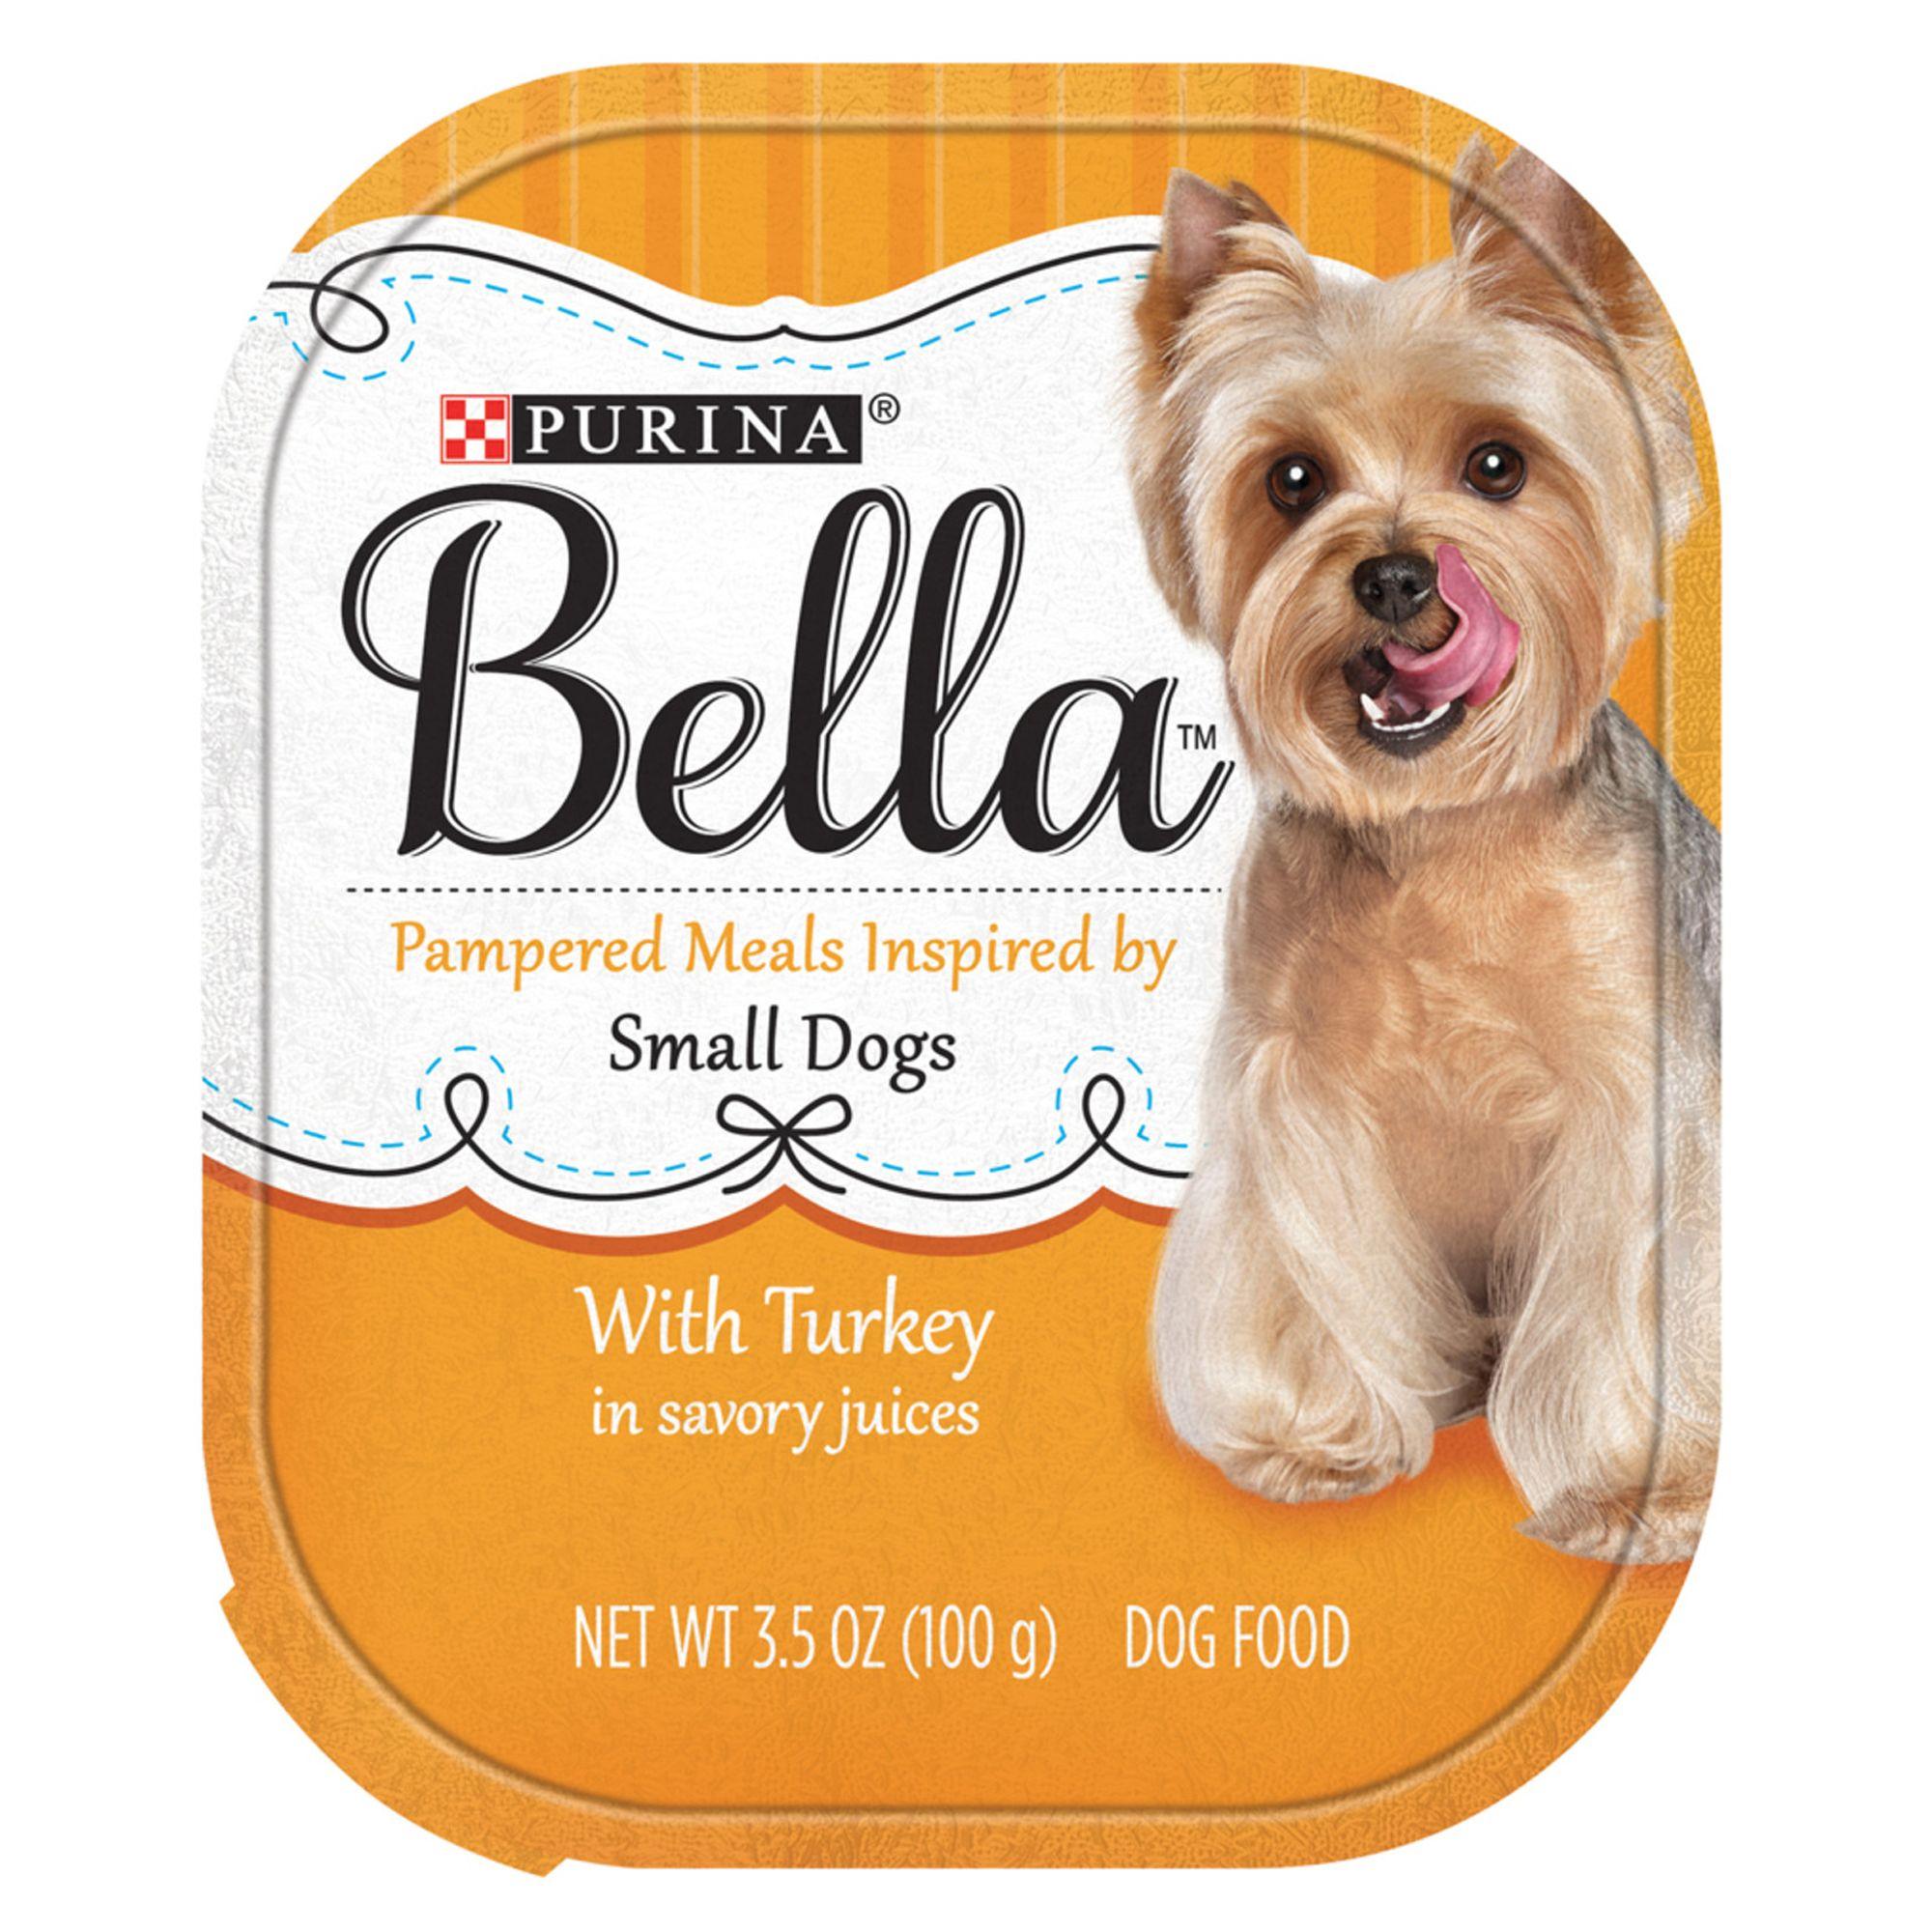 Purina Bella Small Dog Food Turkey Size 3 5 Oz Savory Juices